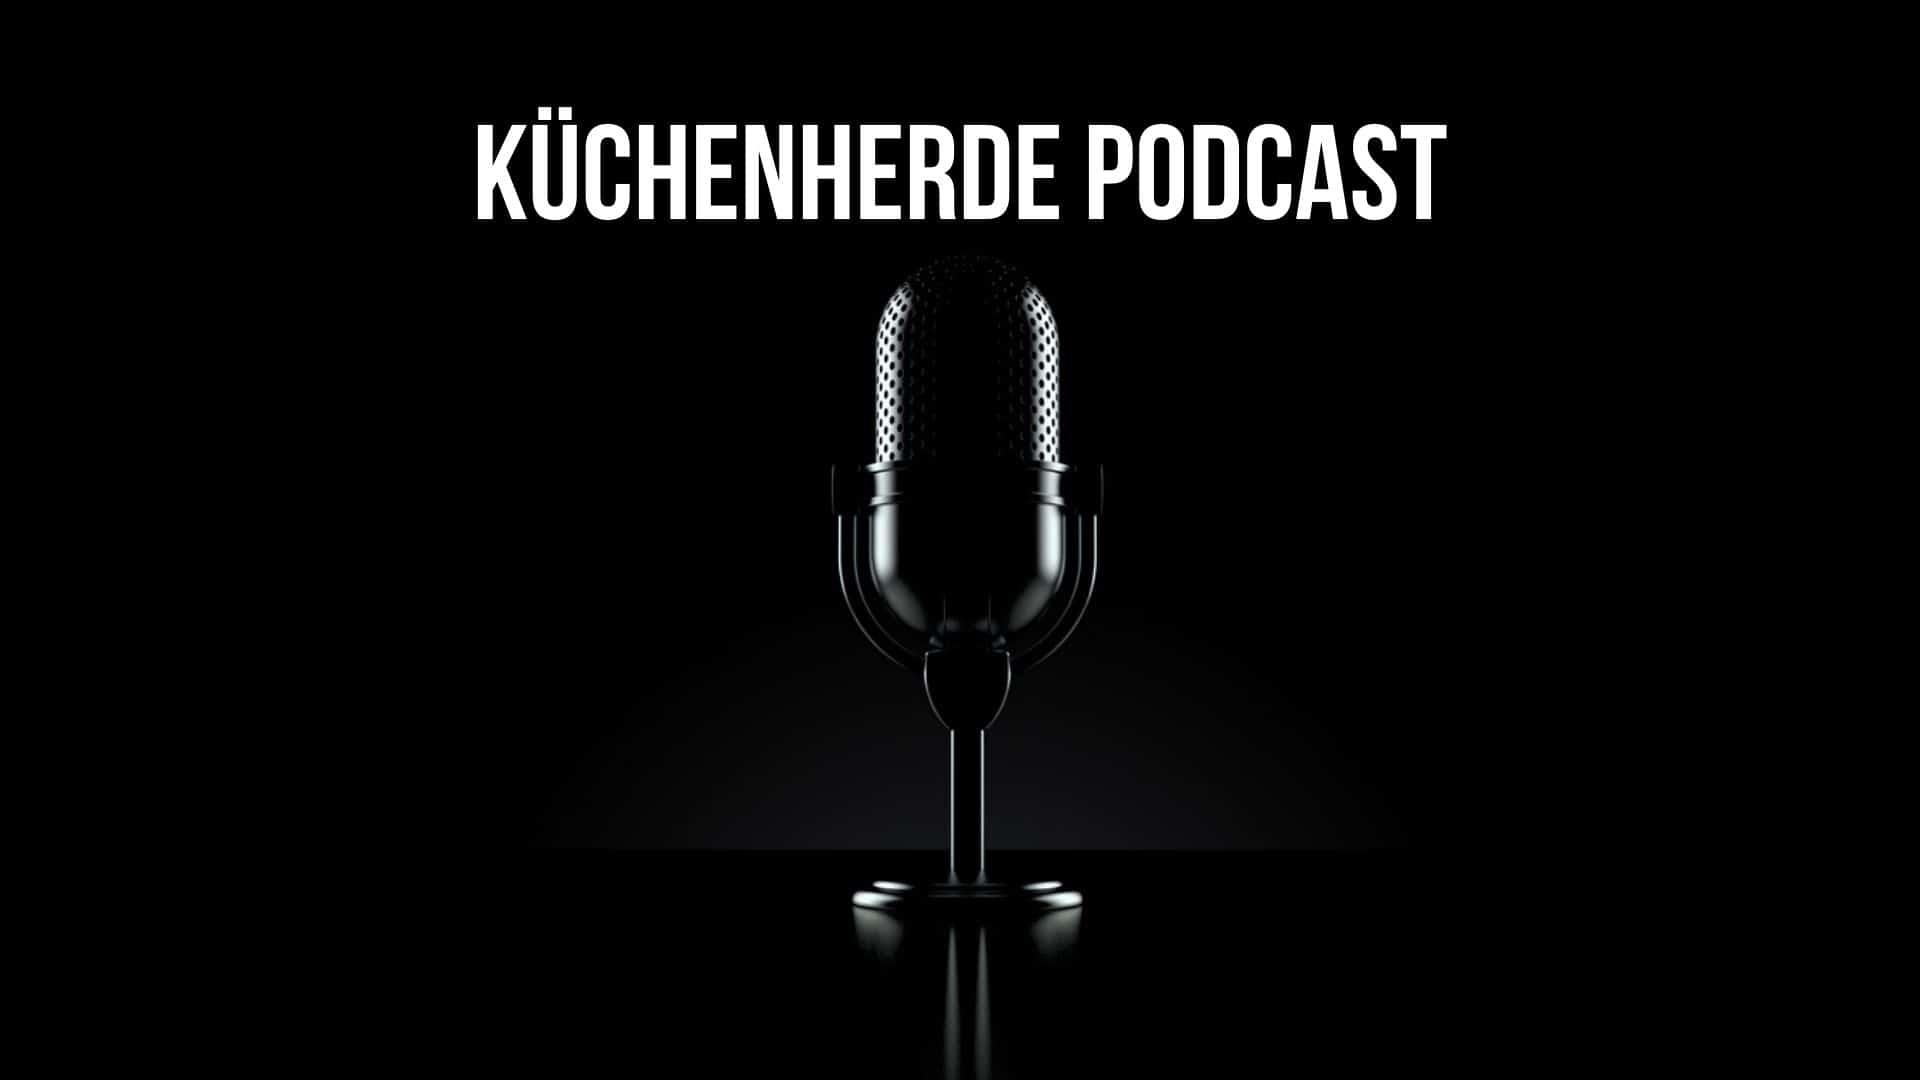 Küchenherde Podcast